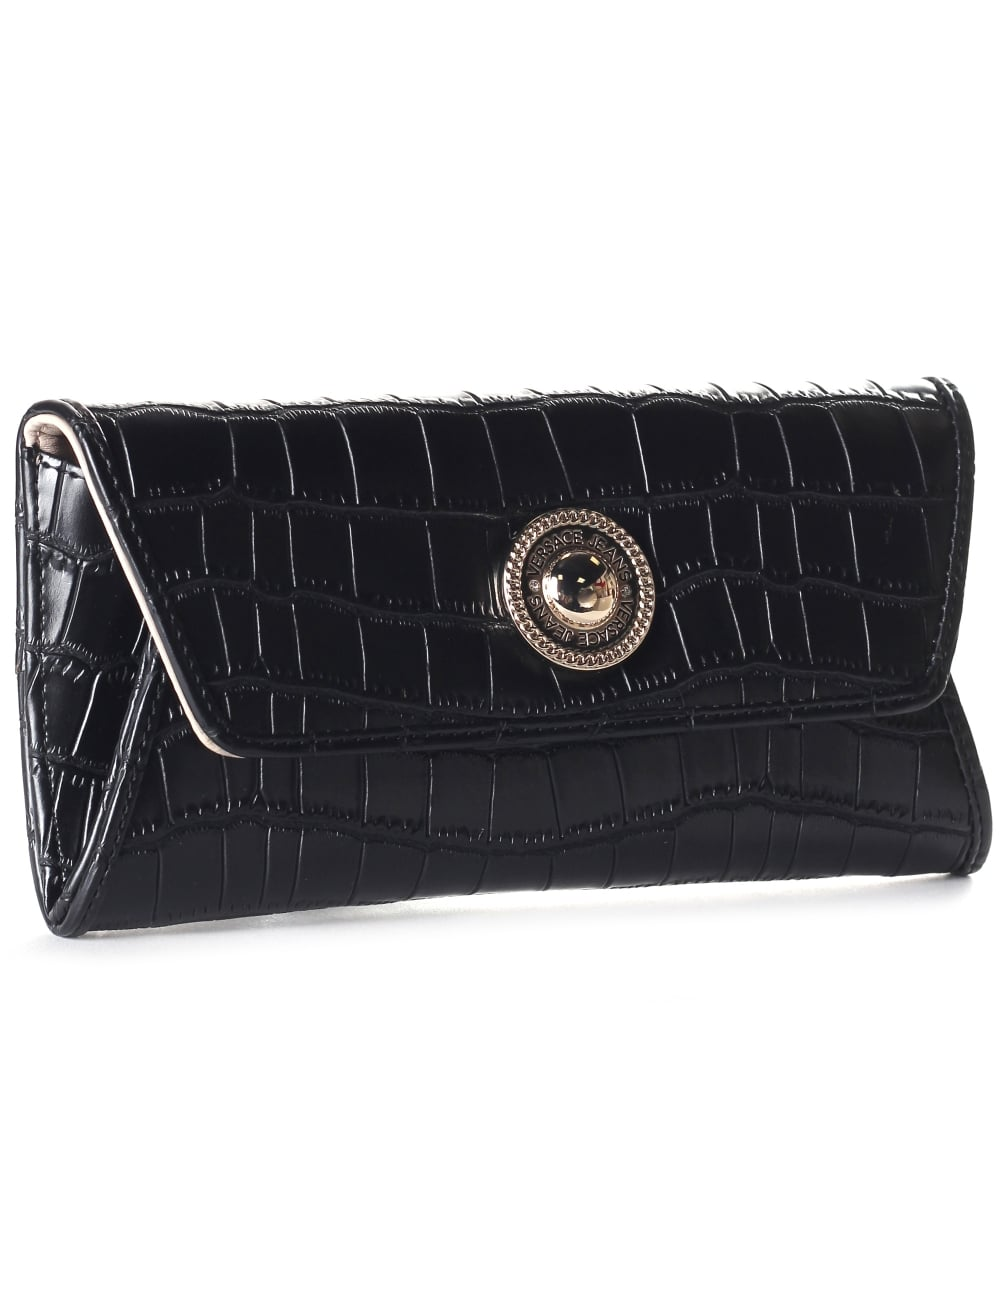 d223b8f6c1426 Versace Jeans Fold Over Women's Croc Clutch/Purse/Bag Black